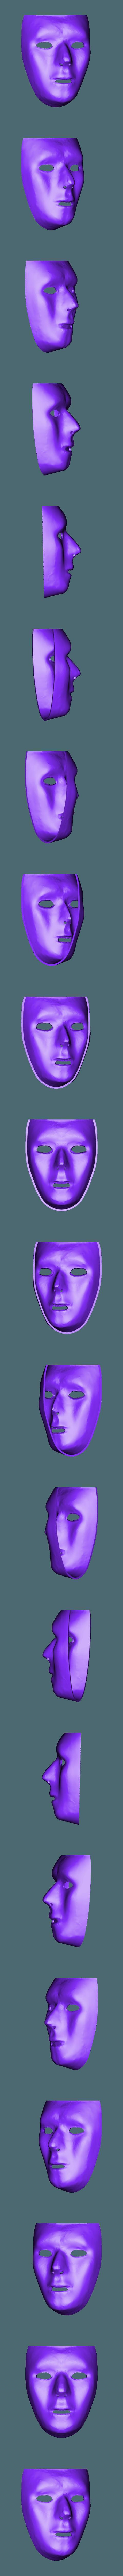 FullVer1_fixed.stl Download free OBJ file Blank Mask • 3D printer object, BenjaminKrygsheld